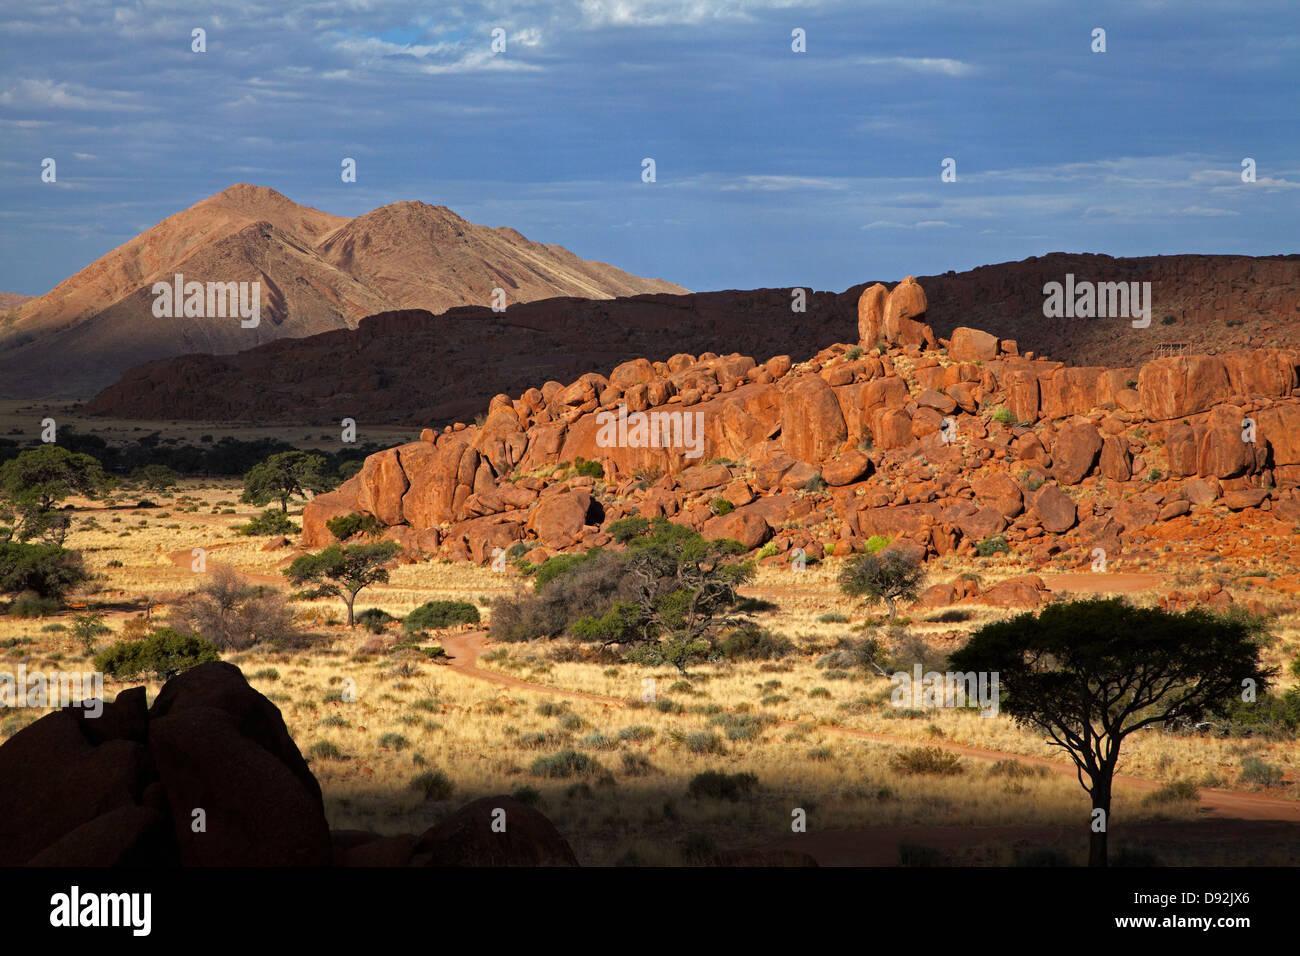 Rock formations, Ranch Koiimasis, Tiras Mountains, Southern Namibia, Africa - Stock Image